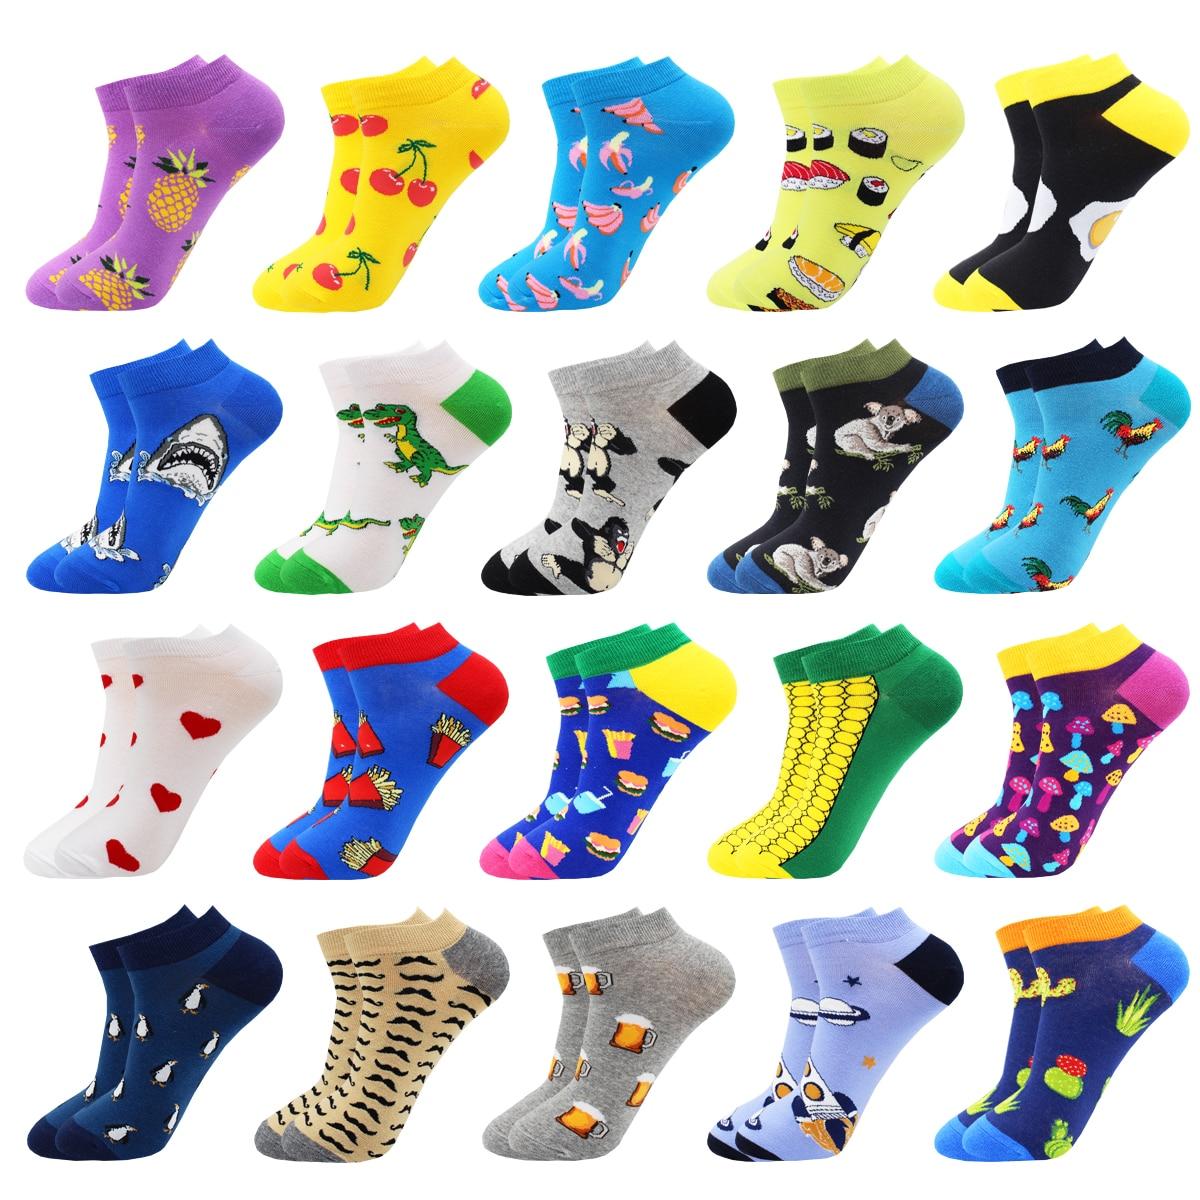 Hip Hop  Harajuku Fruit Animal Cotton Mens Socks Kawaii Pink Cute Fashion Pineapple Cactus Shark Happy Funny Casual Ankle Socks